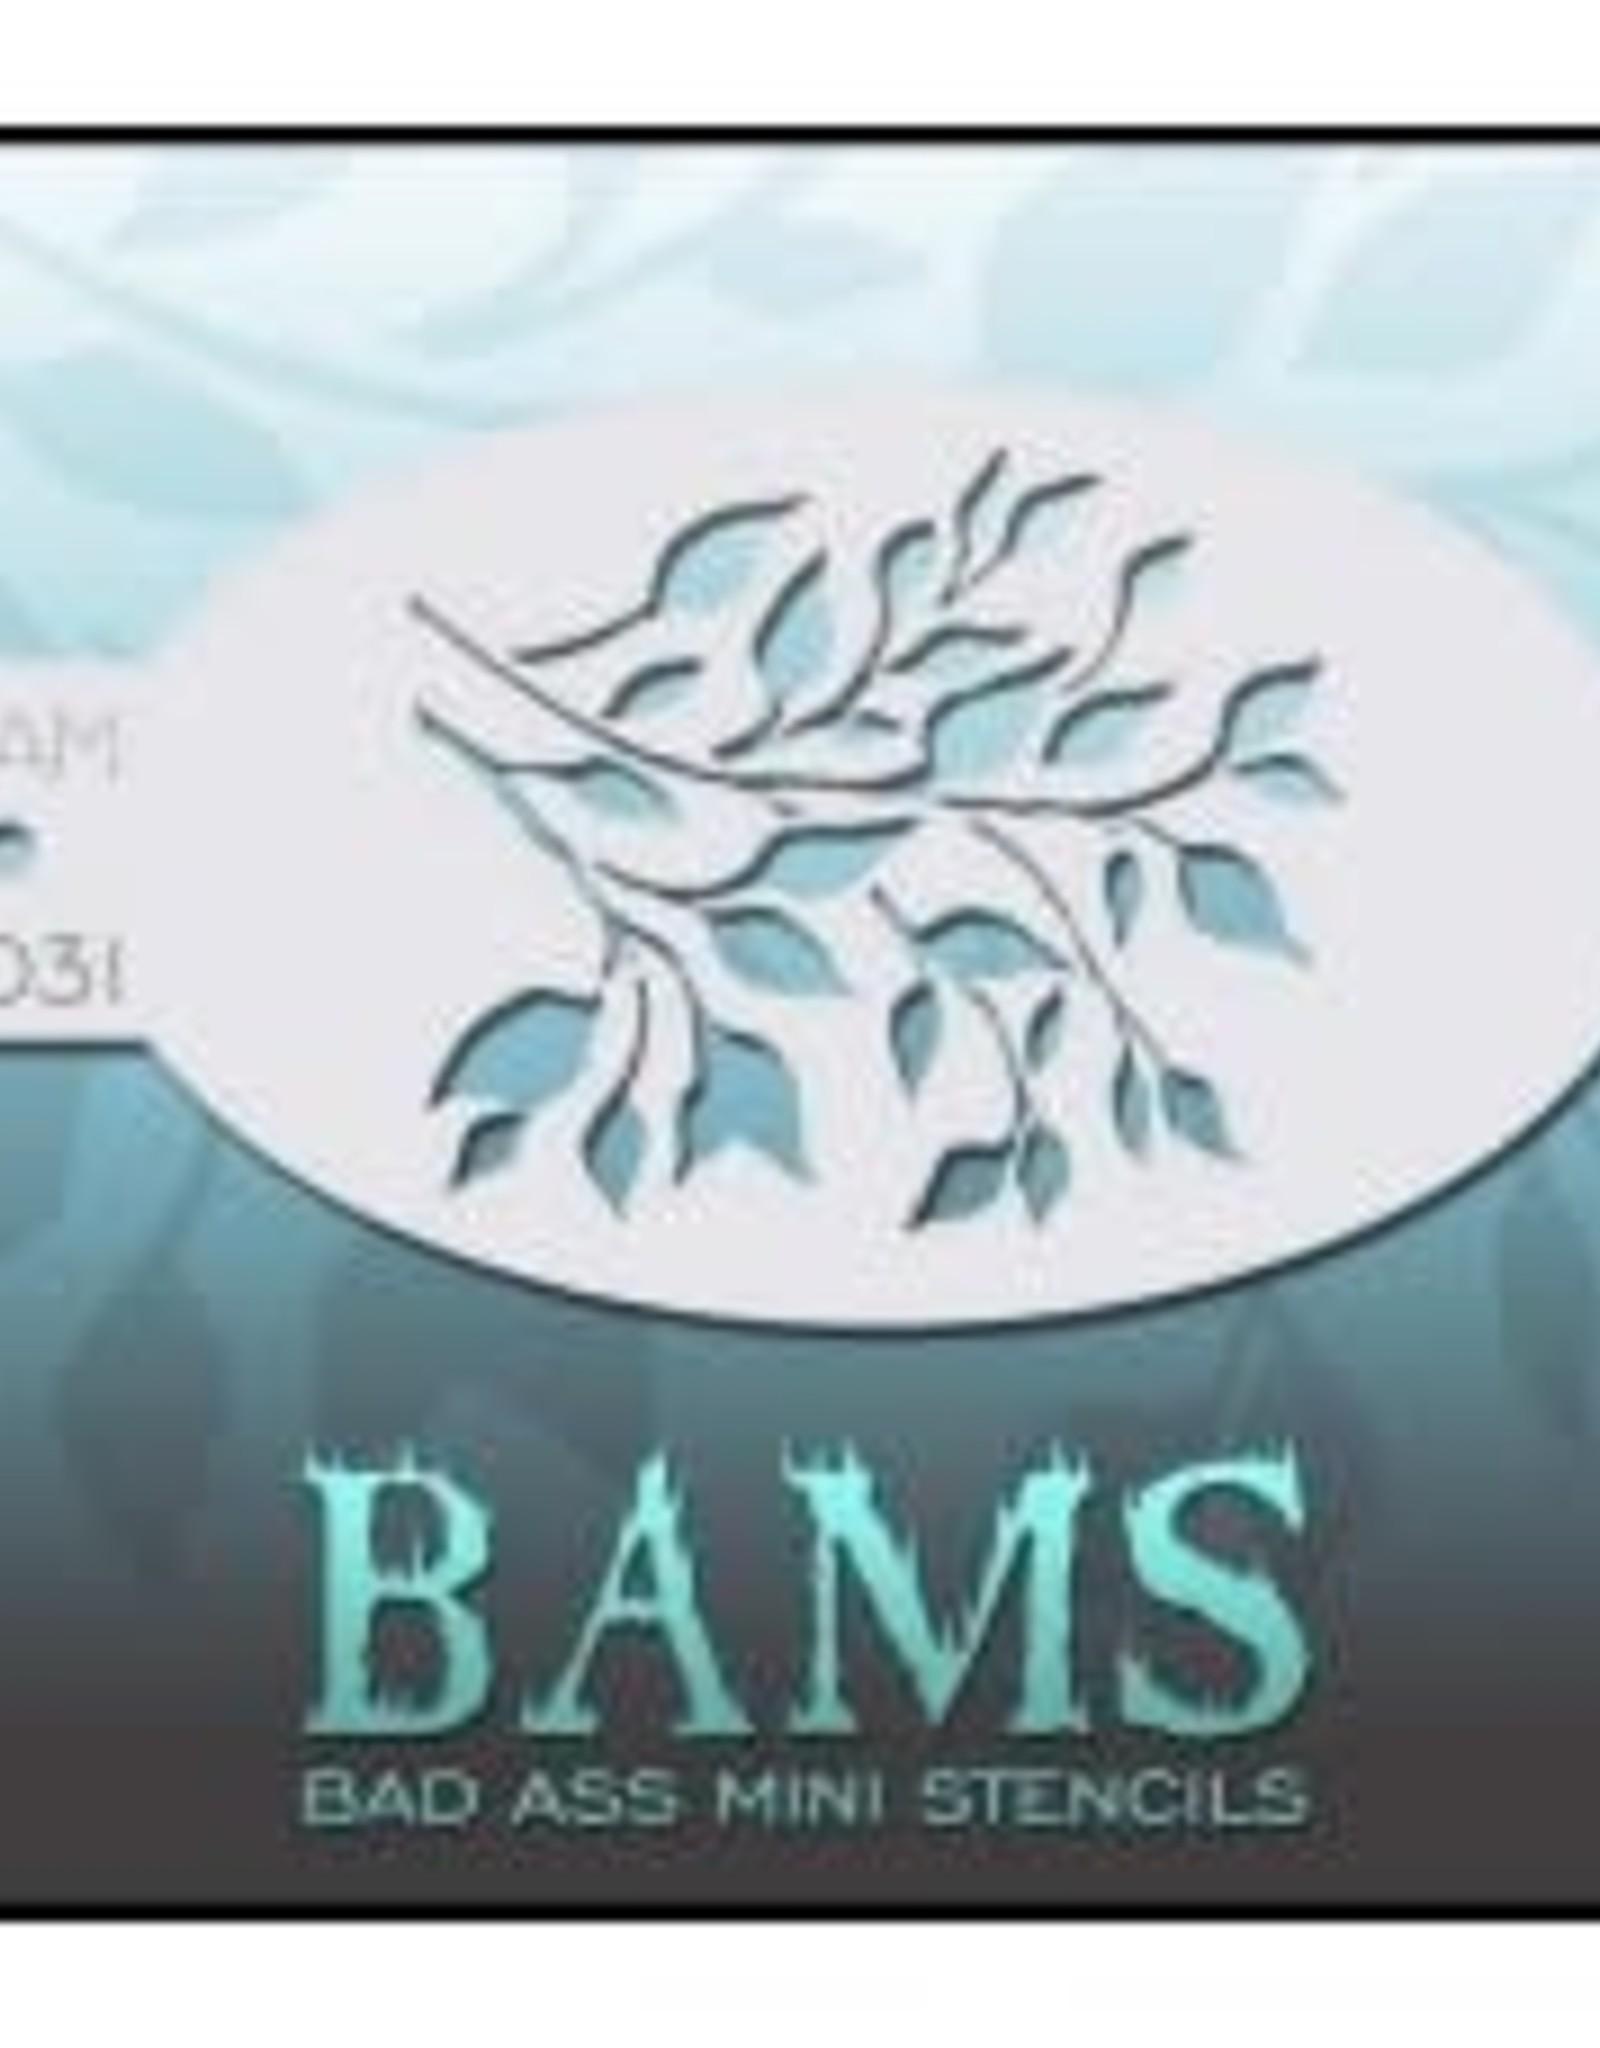 Bad Ass Stencils Bad Ass Mini Stencil - BAM1031